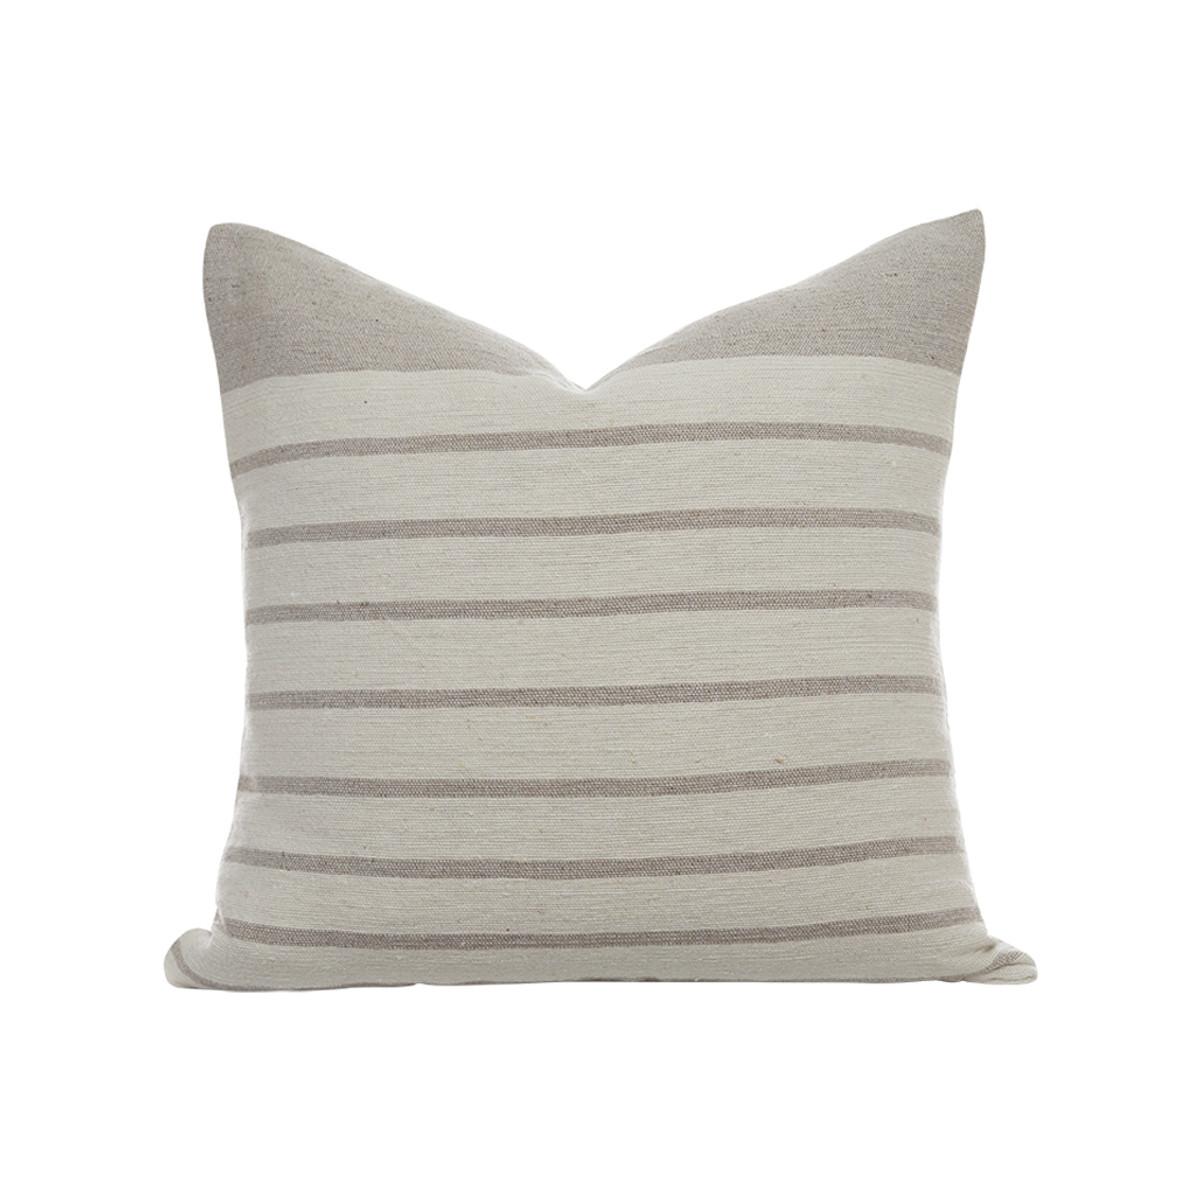 Sailor Pillow Ivory/Lt Taupe Stripe